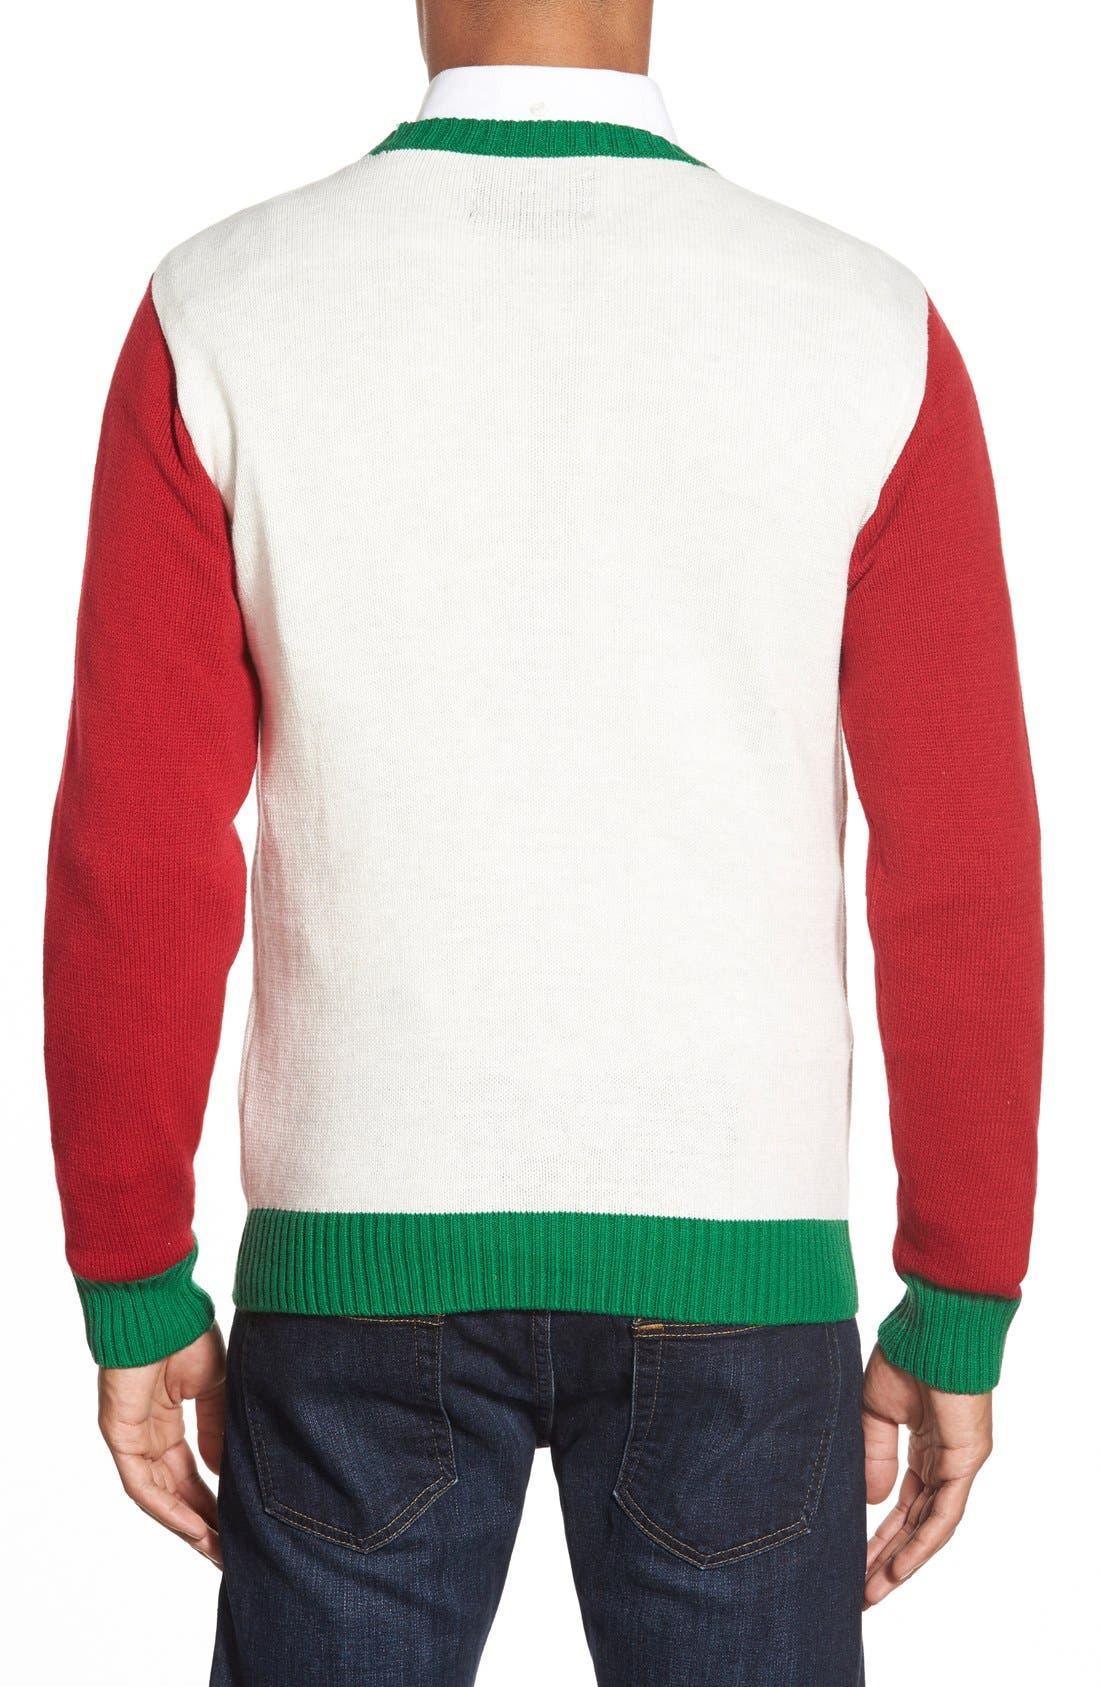 'Emoji Faces' Holiday Crewneck Sweater,                             Alternate thumbnail 4, color,